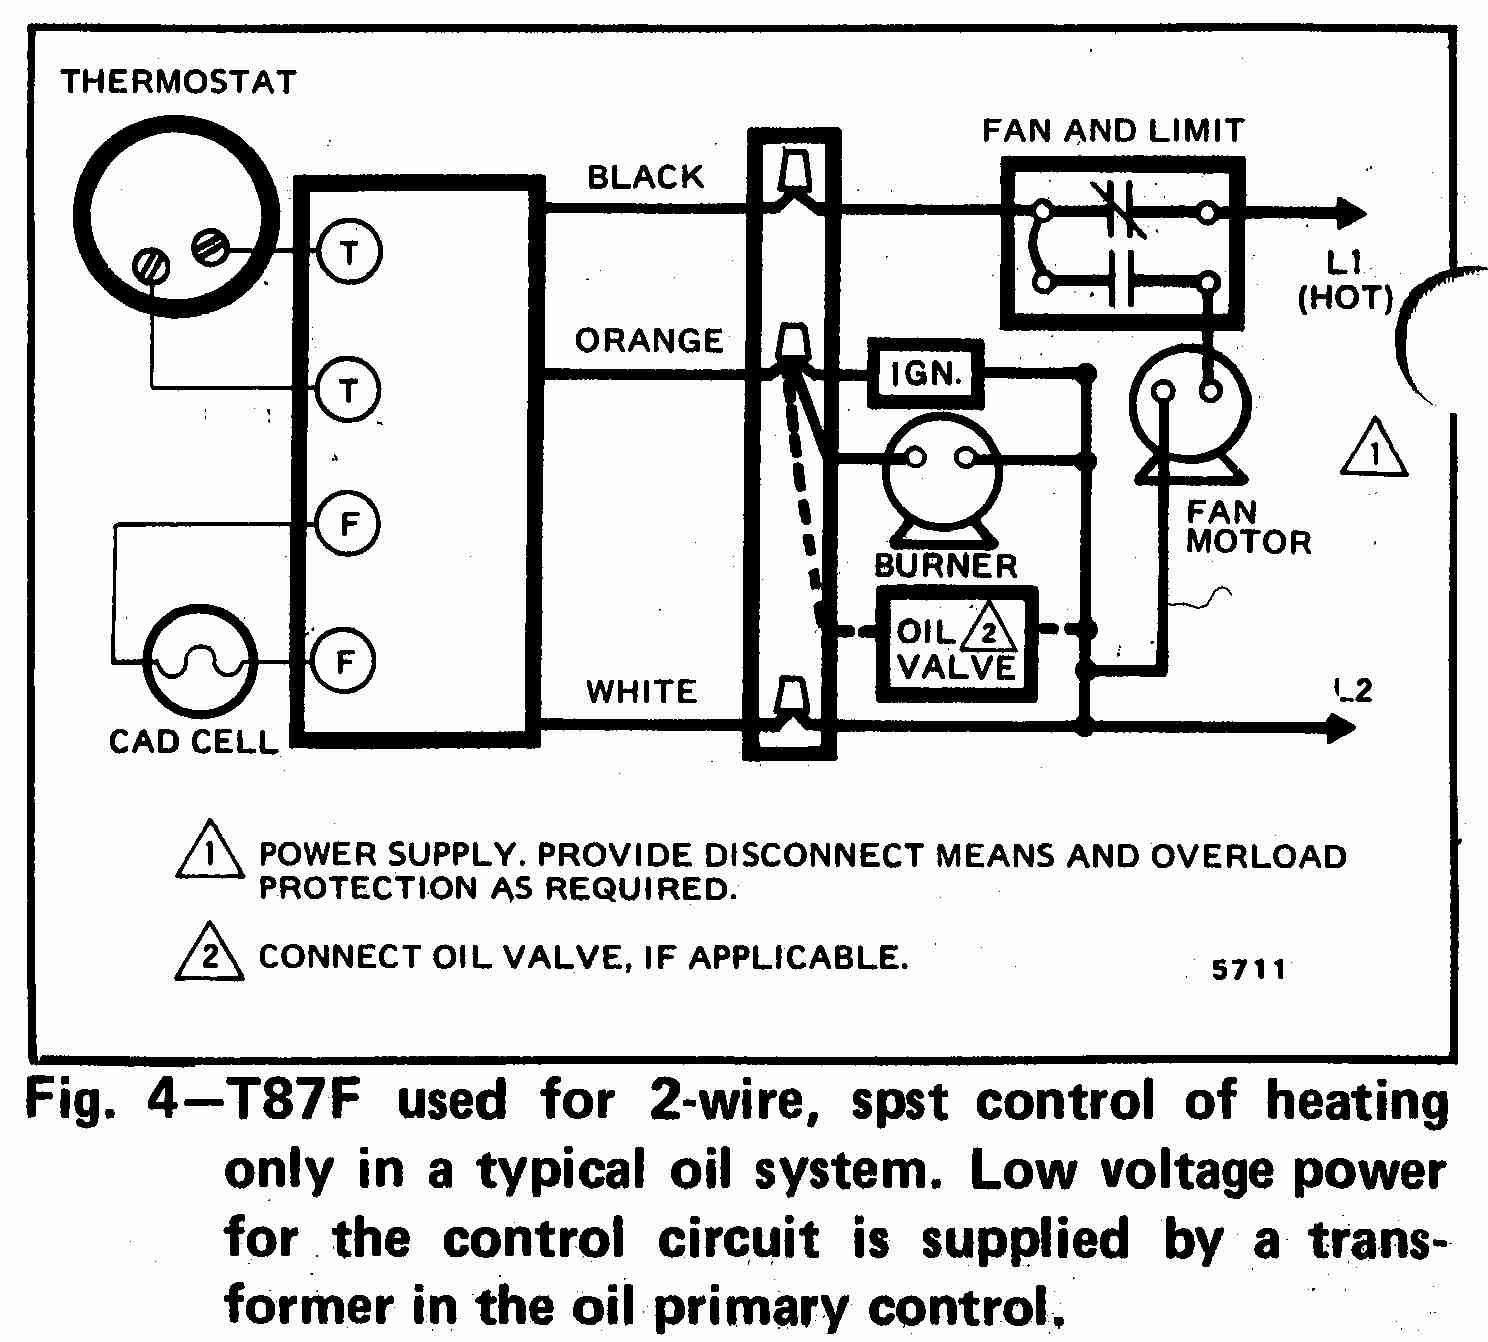 honeywell v8043f1036 wiring diagram diagram diagram wire charthoneywell v8043f1036 wiring diagram [ 1488 x 1342 Pixel ]